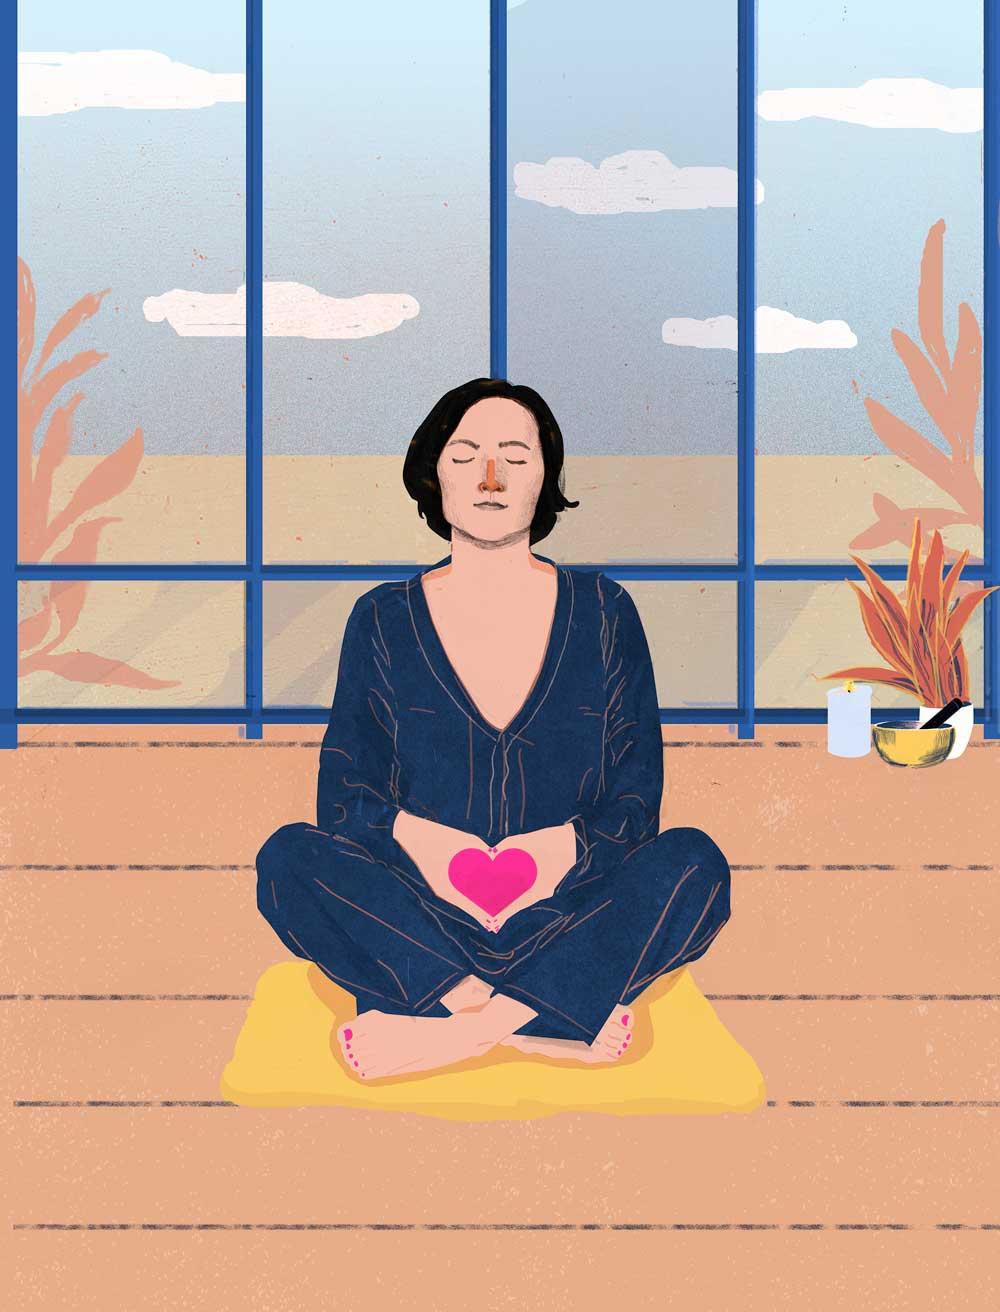 woman yoga illustration heart